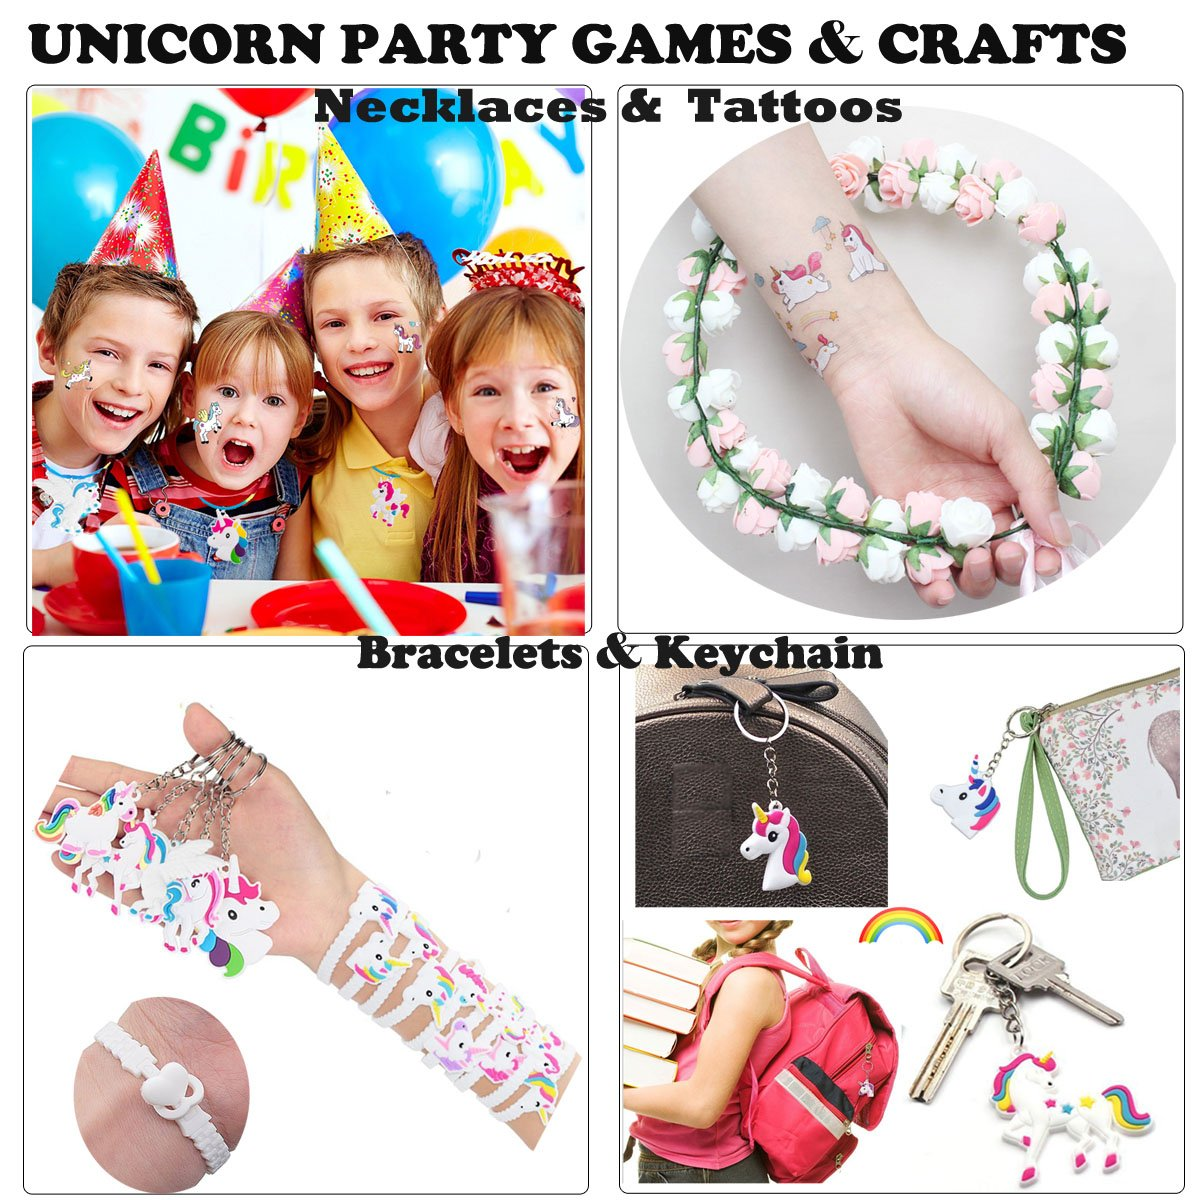 32 Pack CZL Novel Carnival Rainbow Prize Santa Gift Unicorn Theme Sets Includes Unicorn Necklaces Bracelets Keychains Kids Girl Birthday Decoration Toy Kit Bonus Tattoos Unicorn Party Favors Supplies